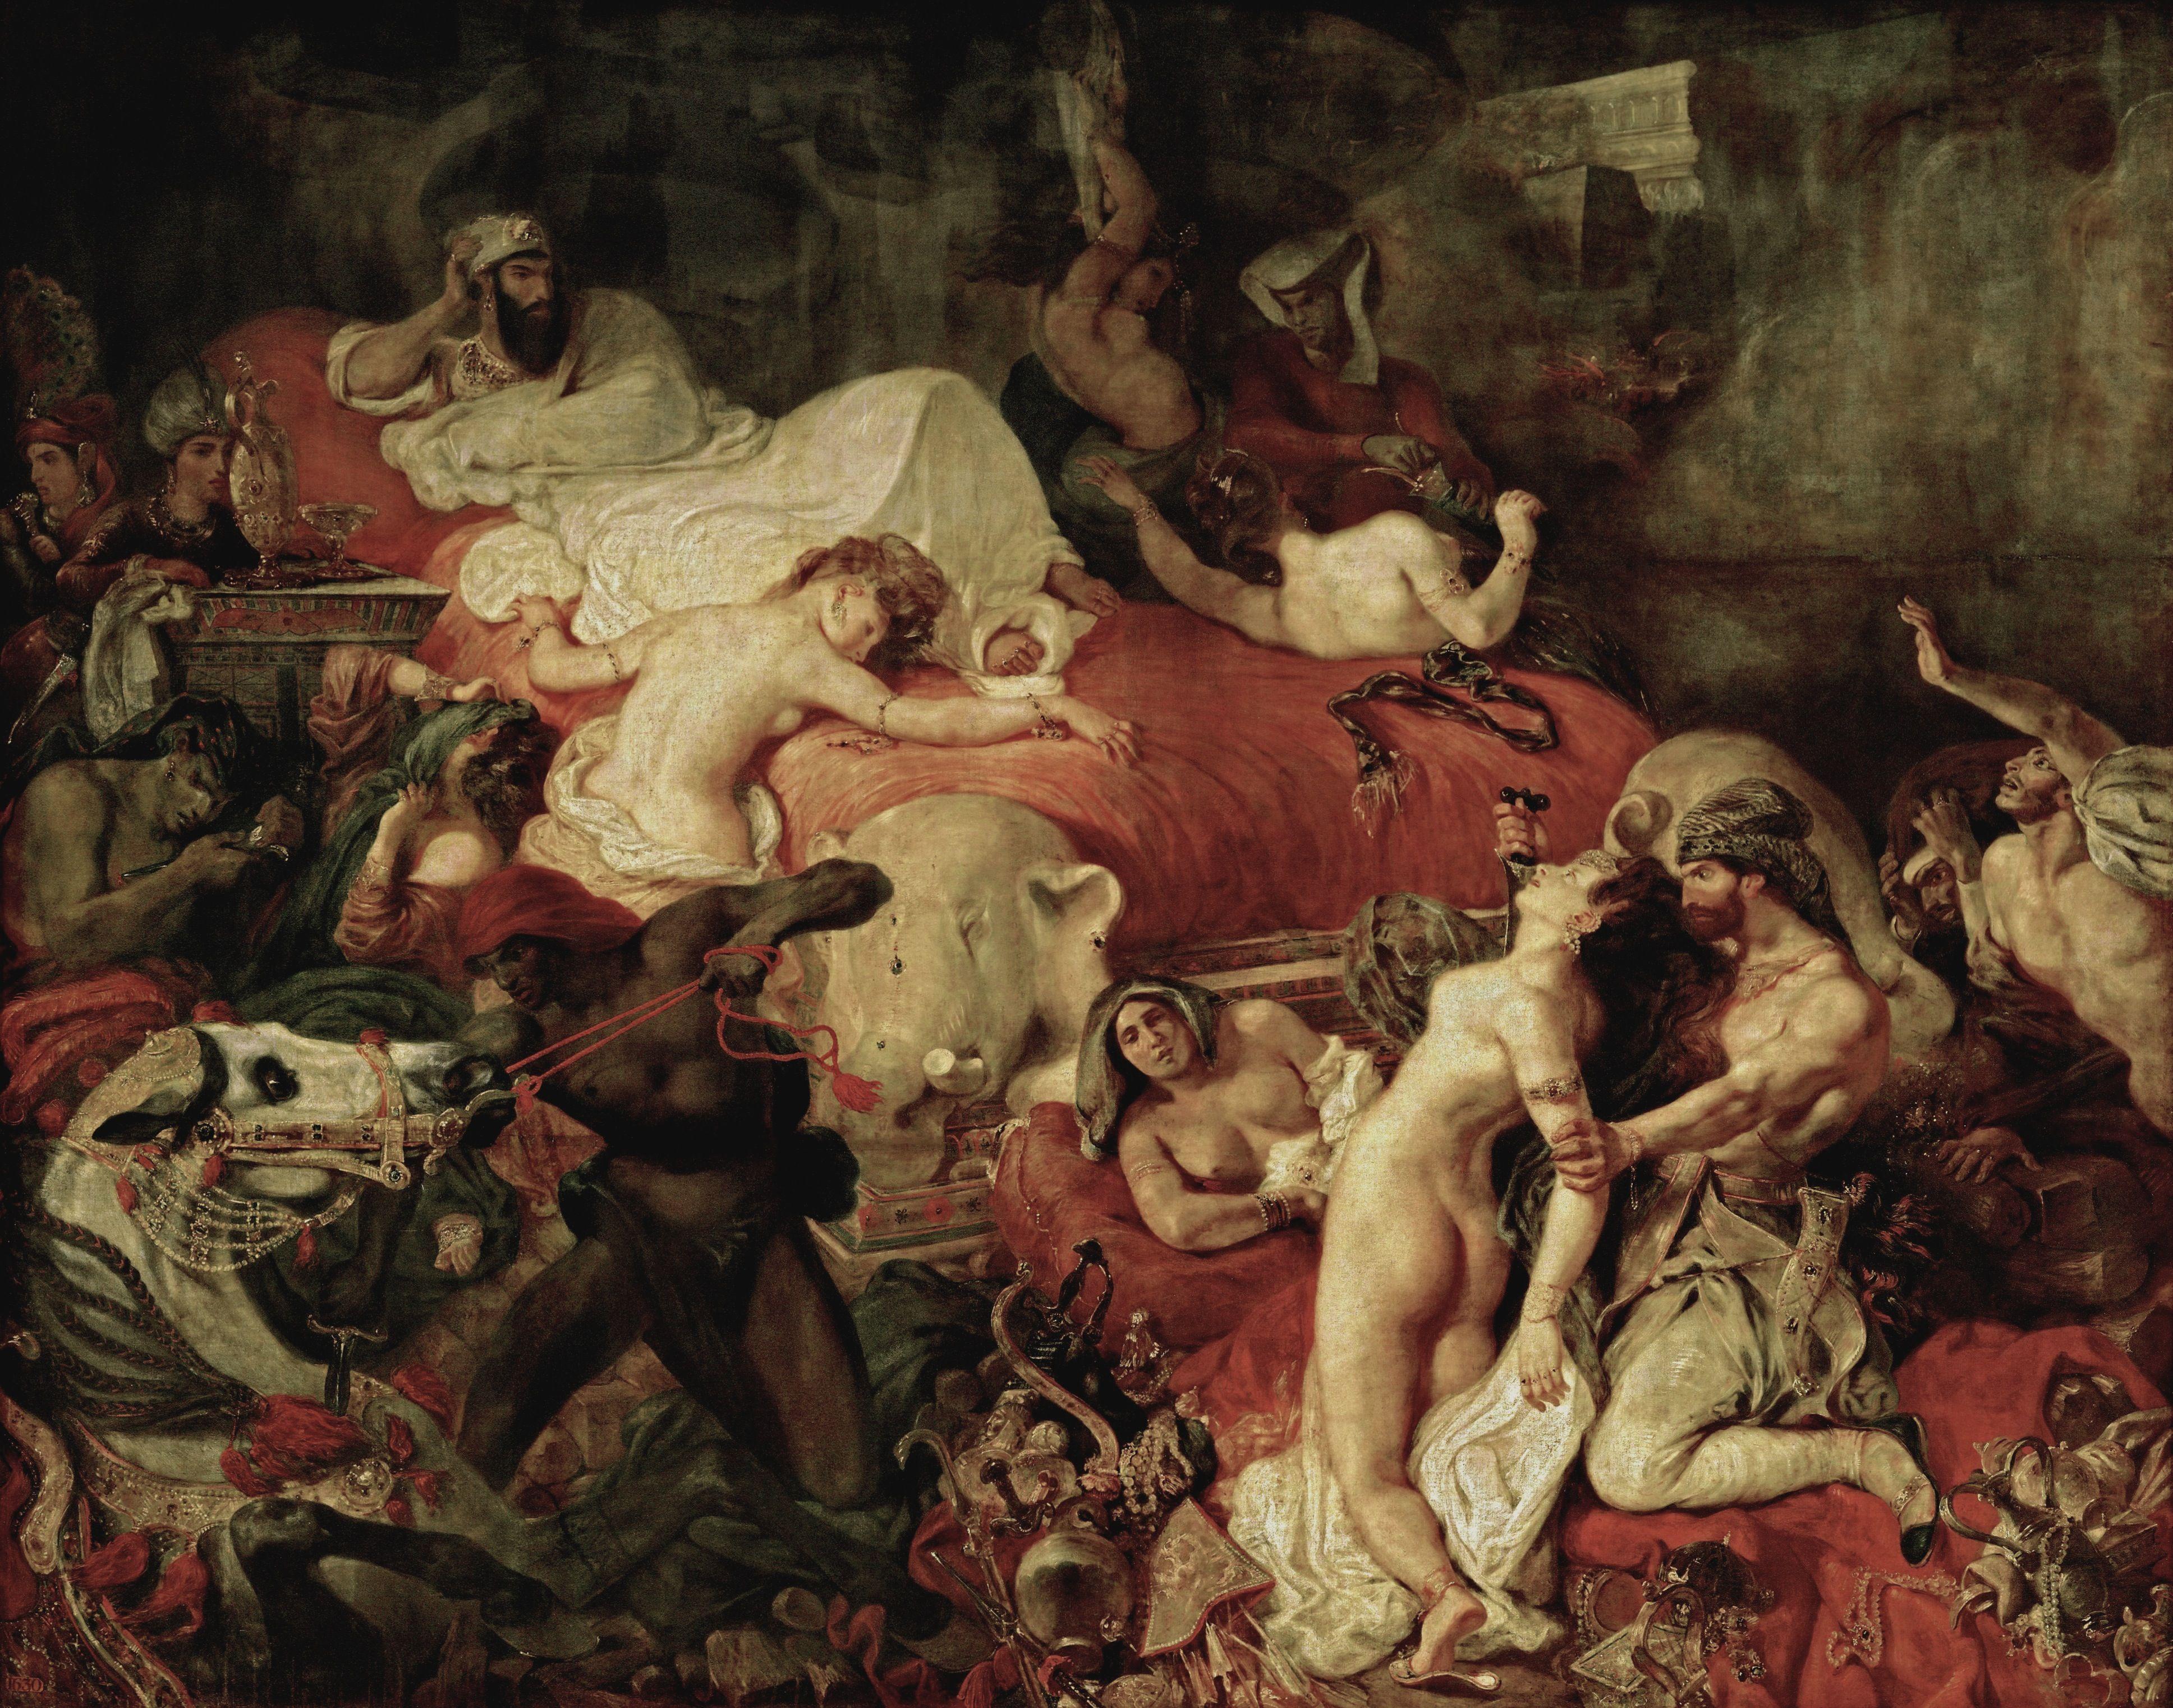 Figure 4. A morte de Sardanapalo (Salão de 1827). Paris, Louvre.